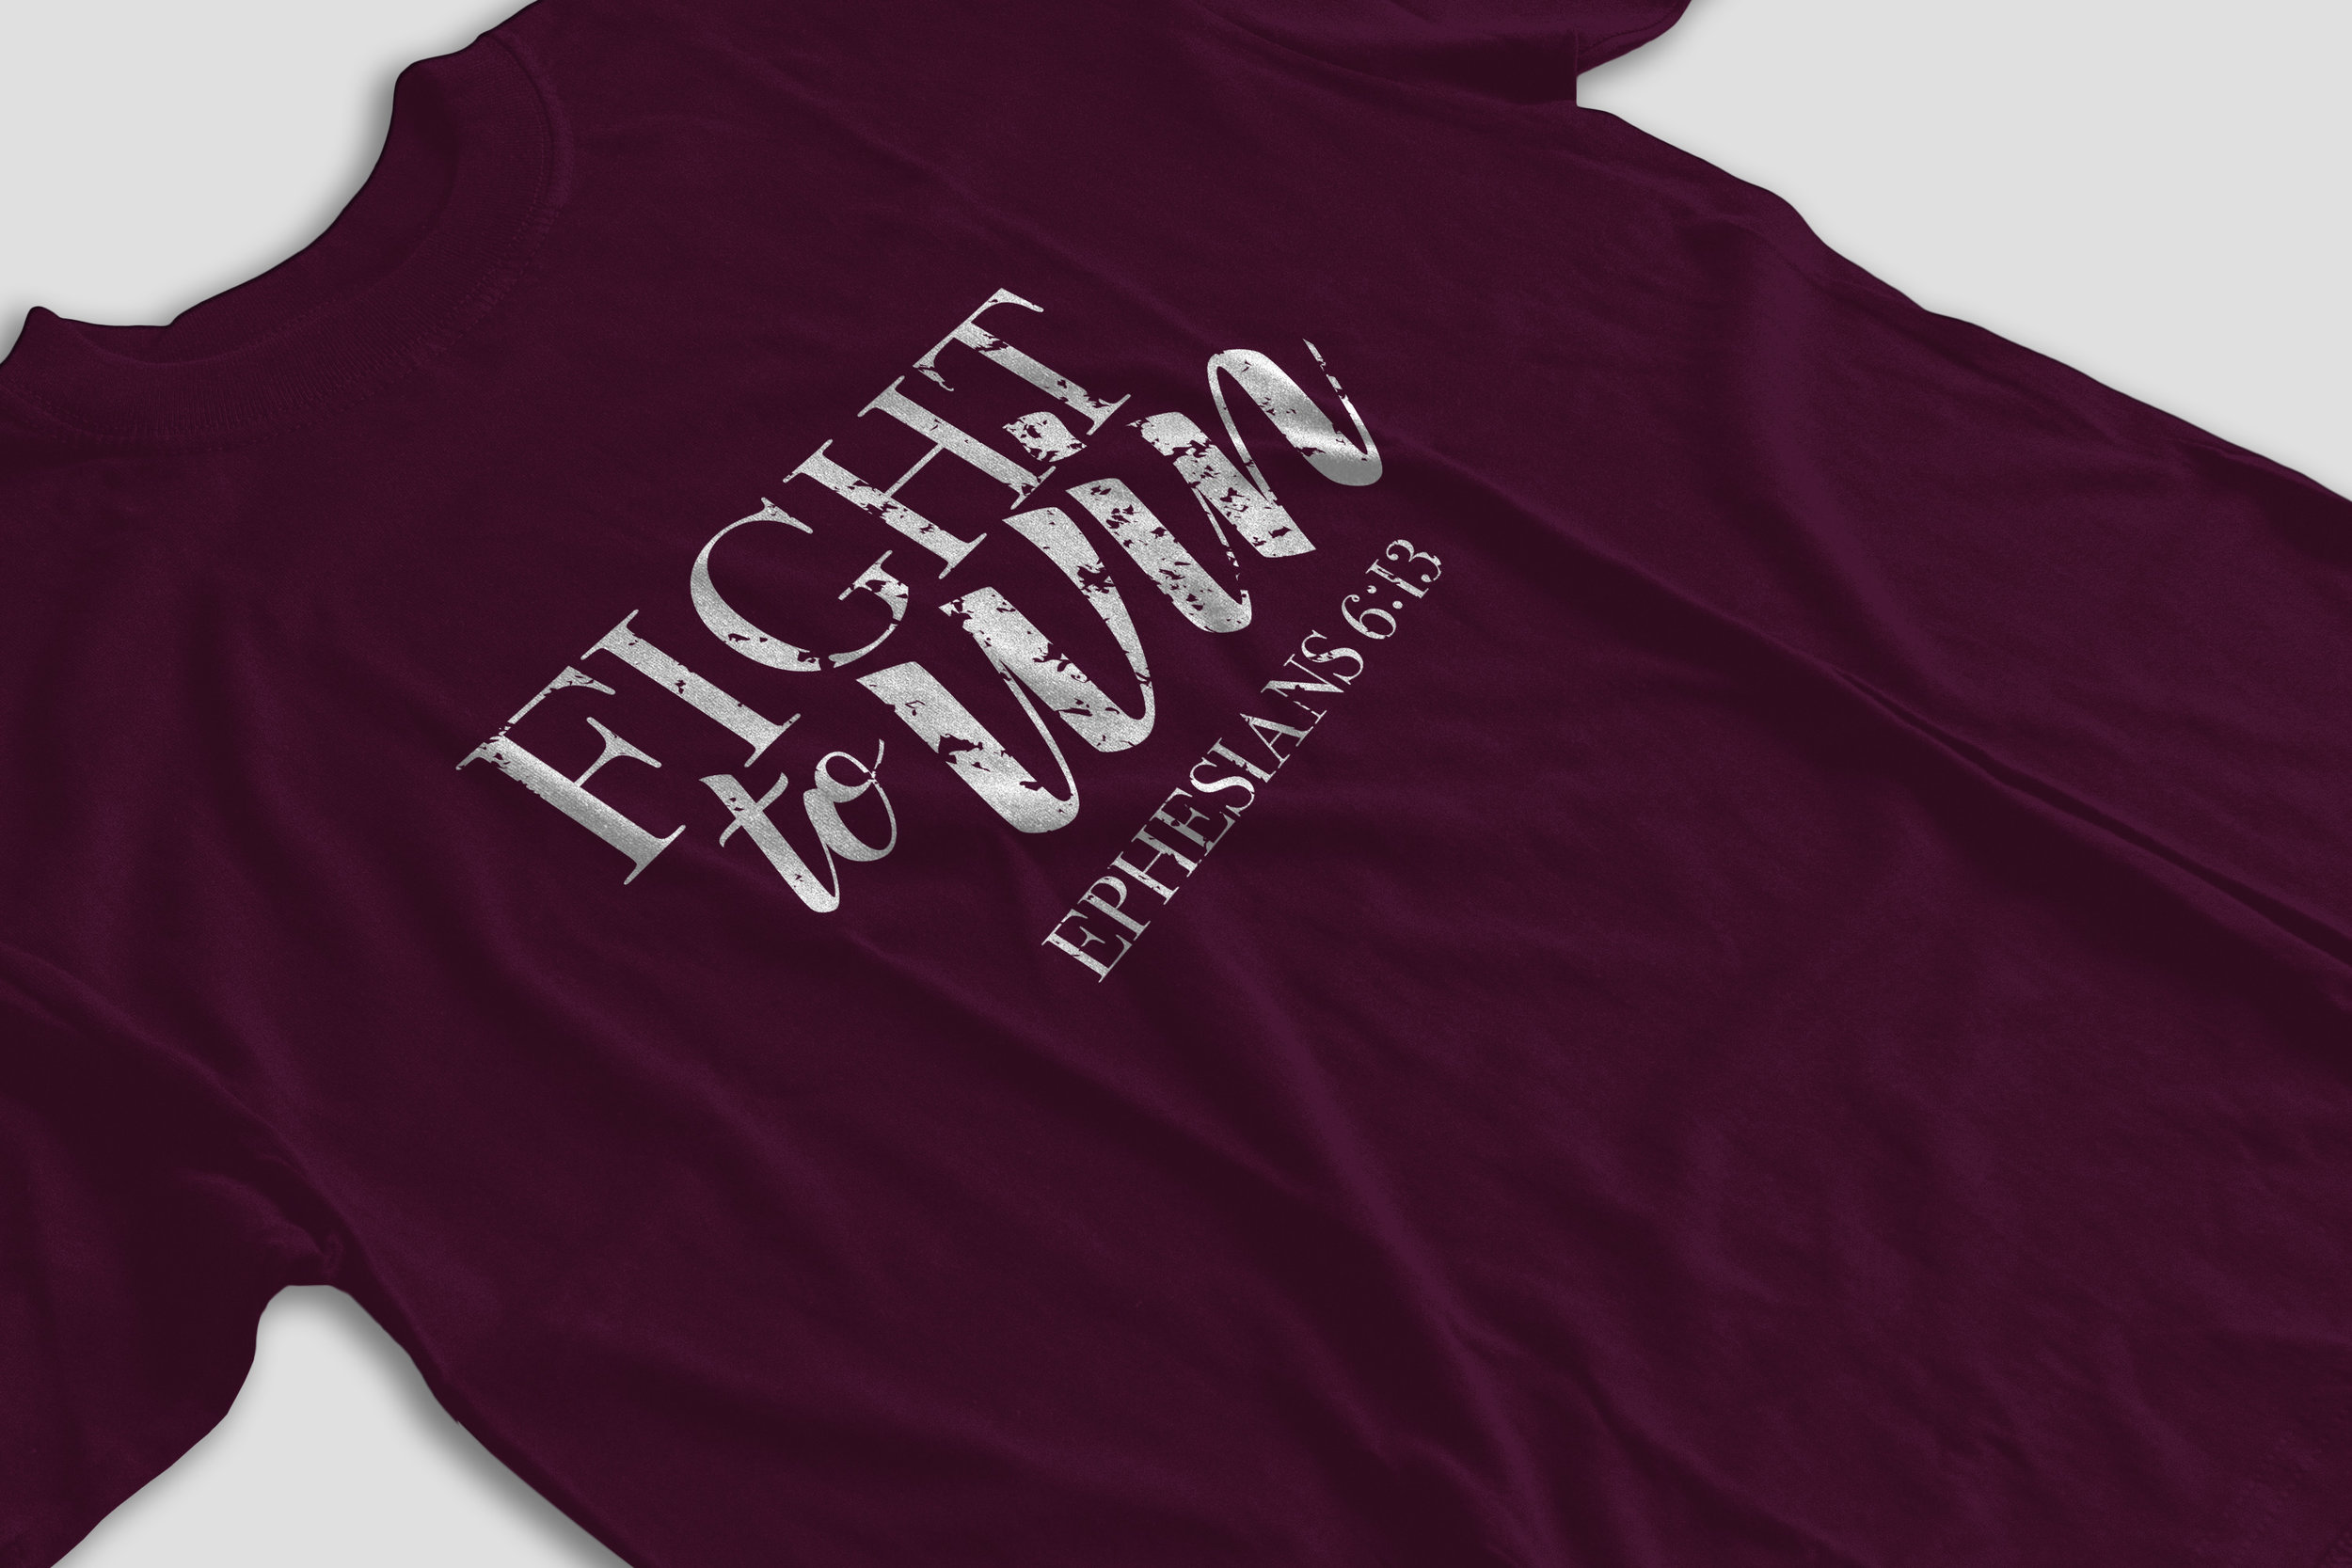 Fight-To-Win-Tour-Author-Branding-Design.jpg